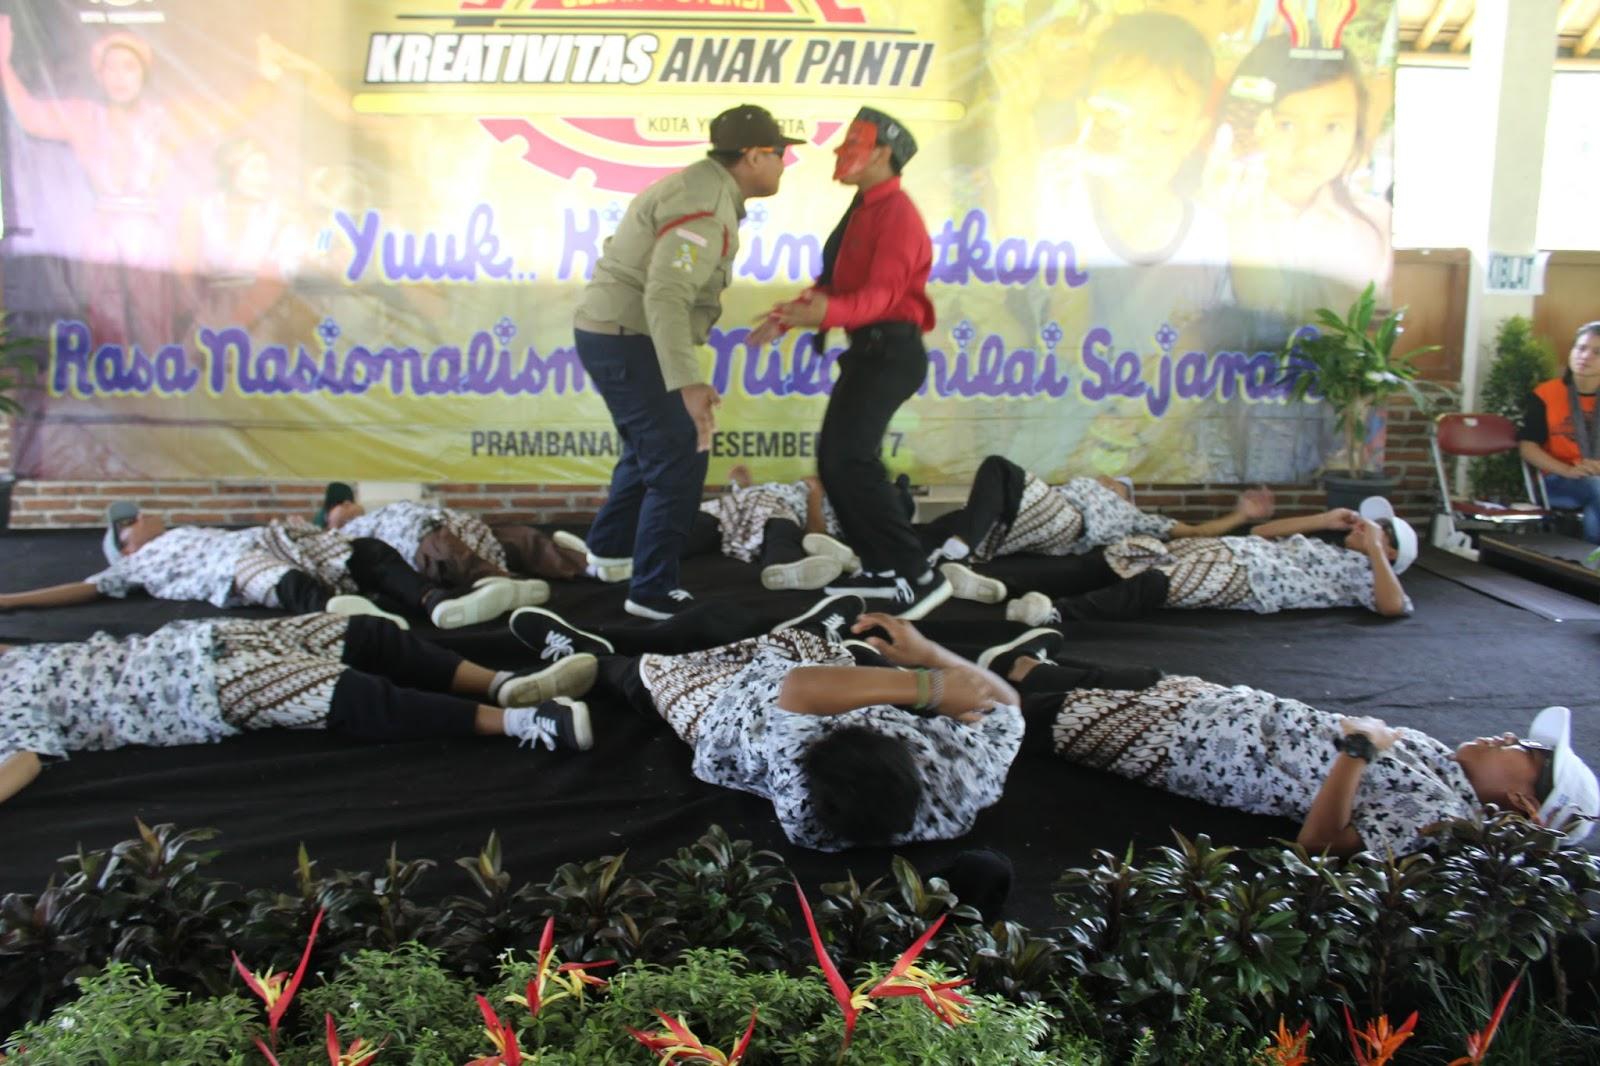 2017 Panti Asuhan Putra Islam Produk Ukm Bumn Sajadah Anak Laki Goyang 2